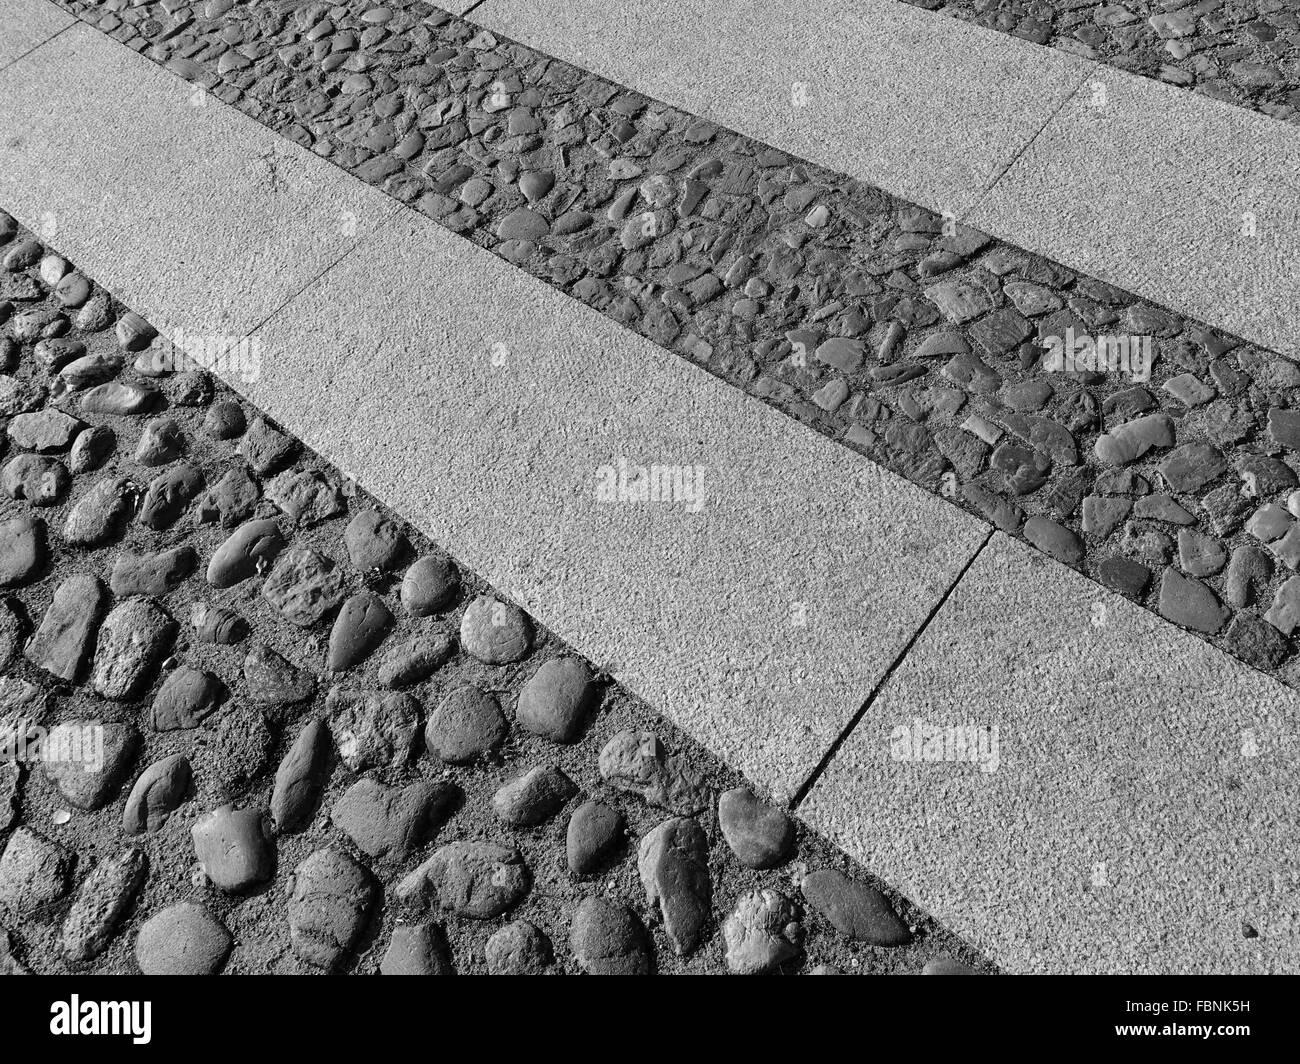 Hintergründe der Pebble Gehweg Stockbild